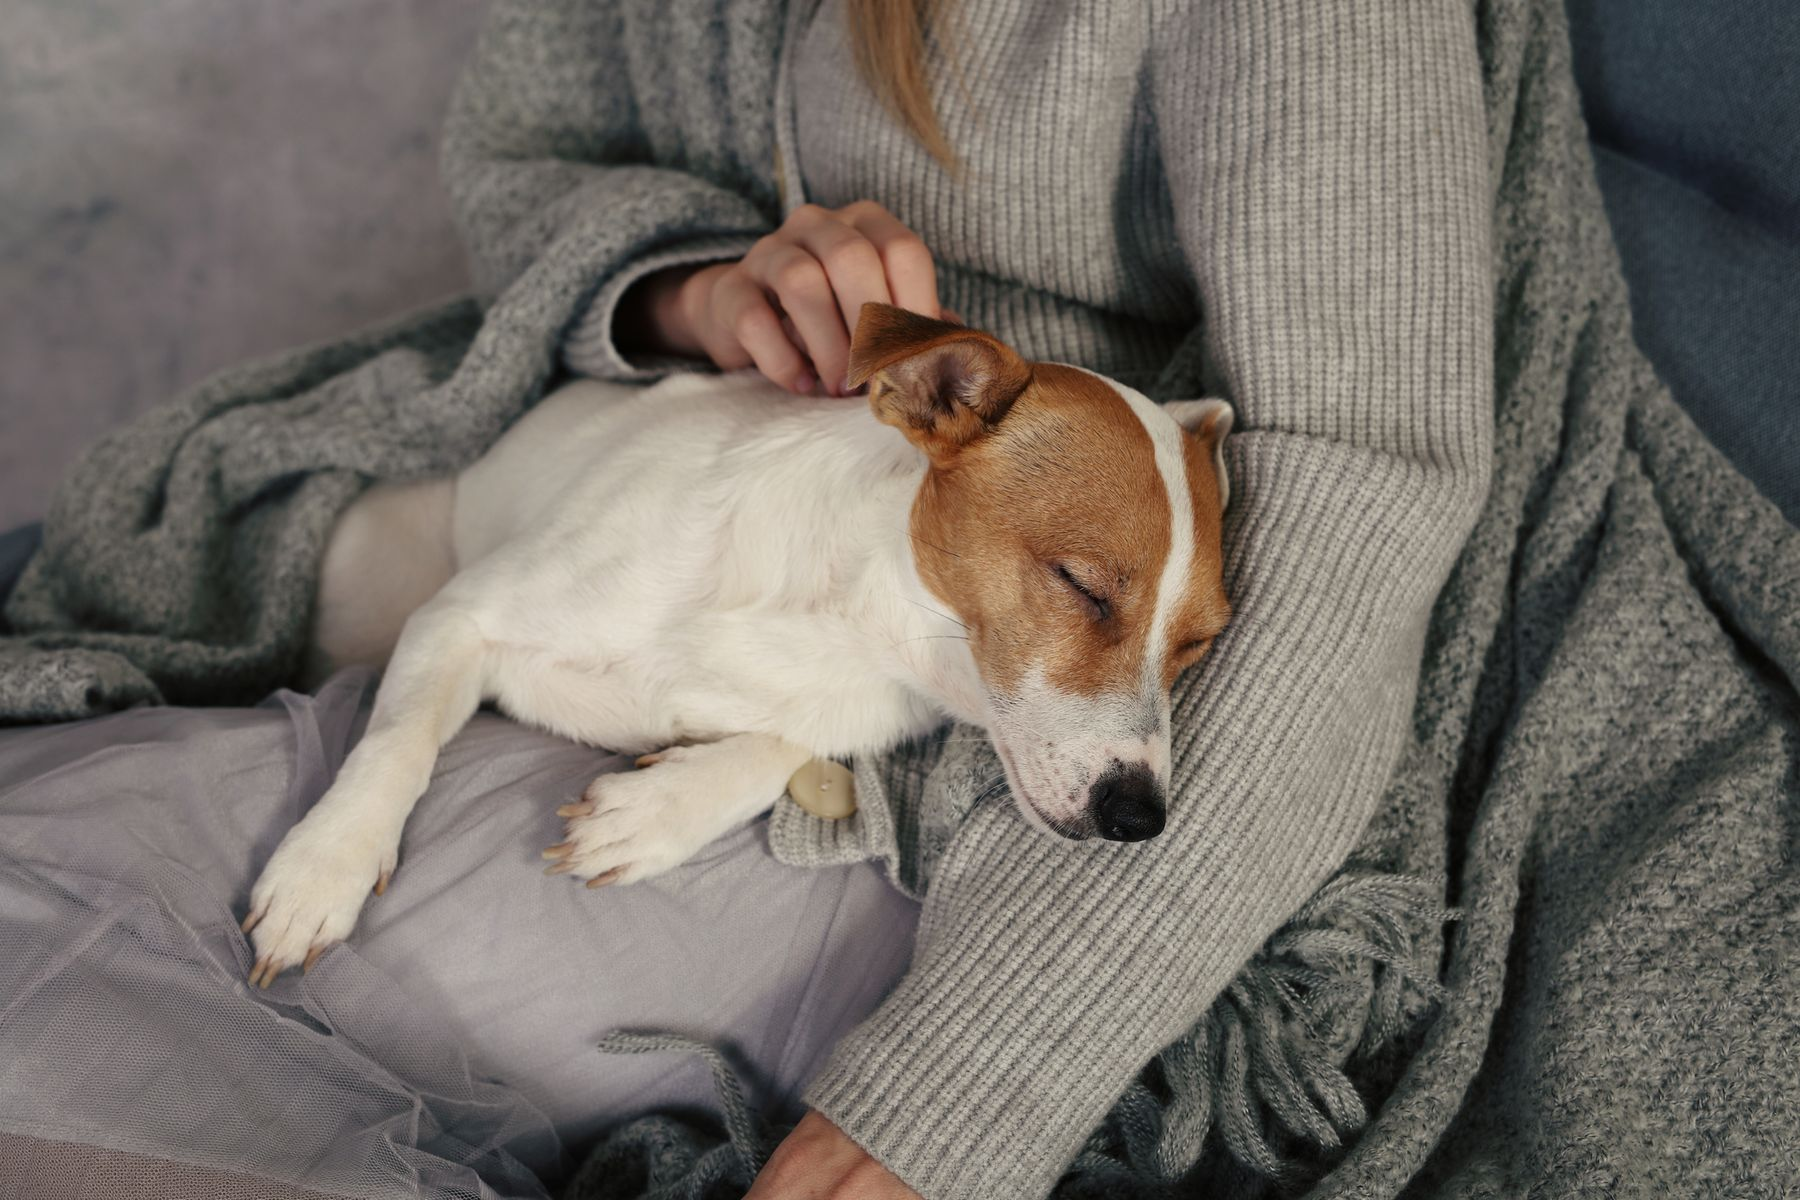 Woman in a grey merino wool jumper holding a sleeping dog